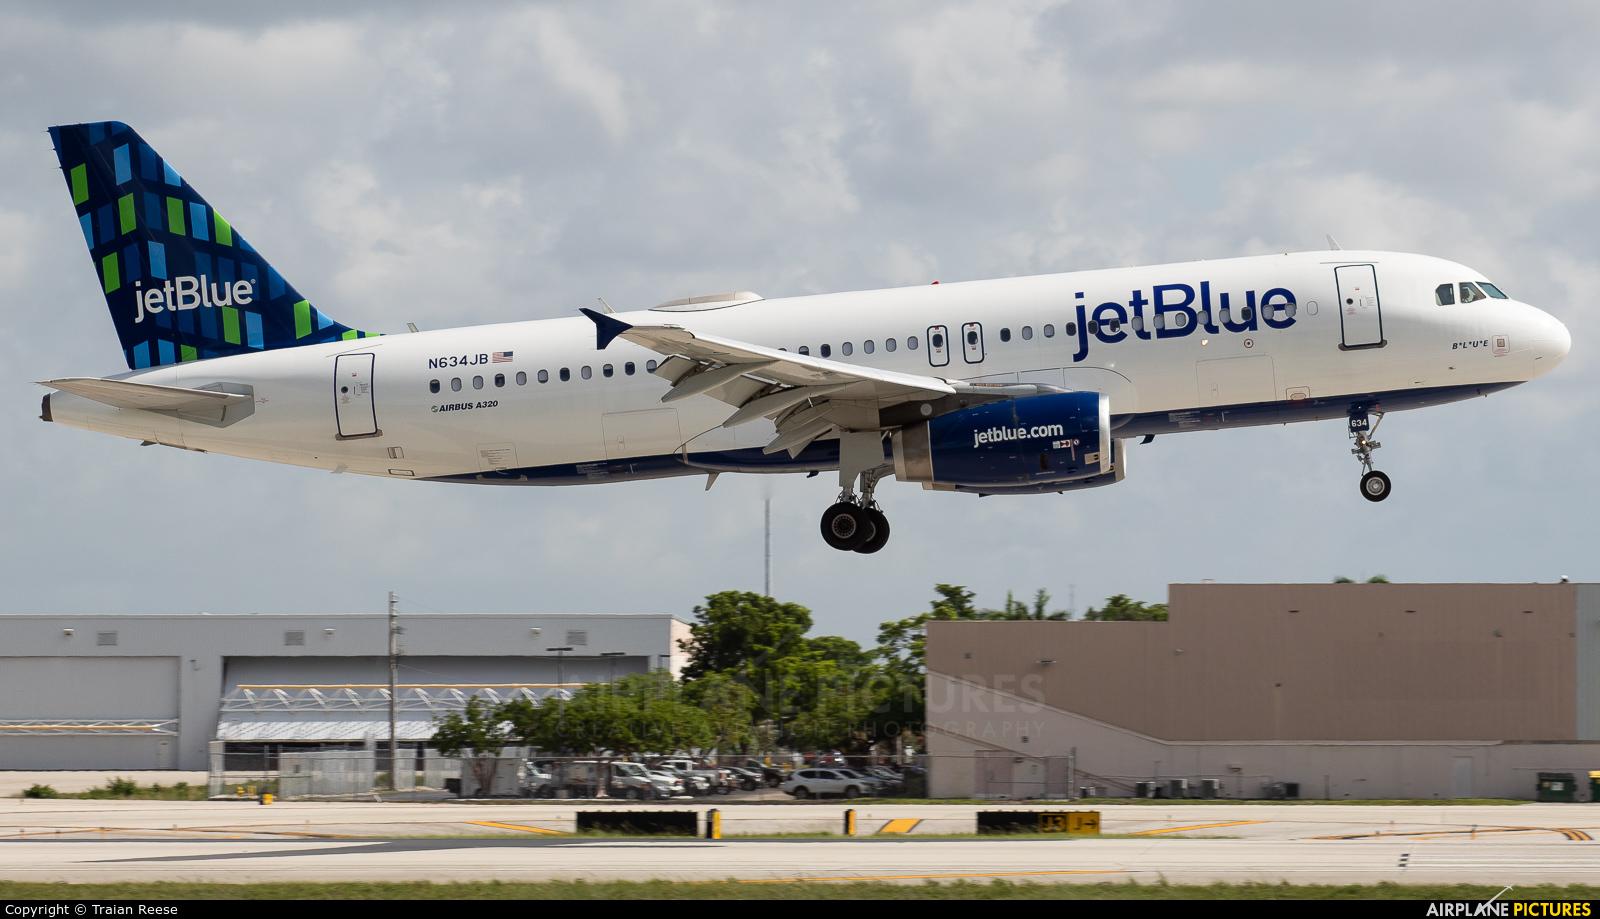 JetBlue Airways N634JB aircraft at Fort Lauderdale - Hollywood Intl